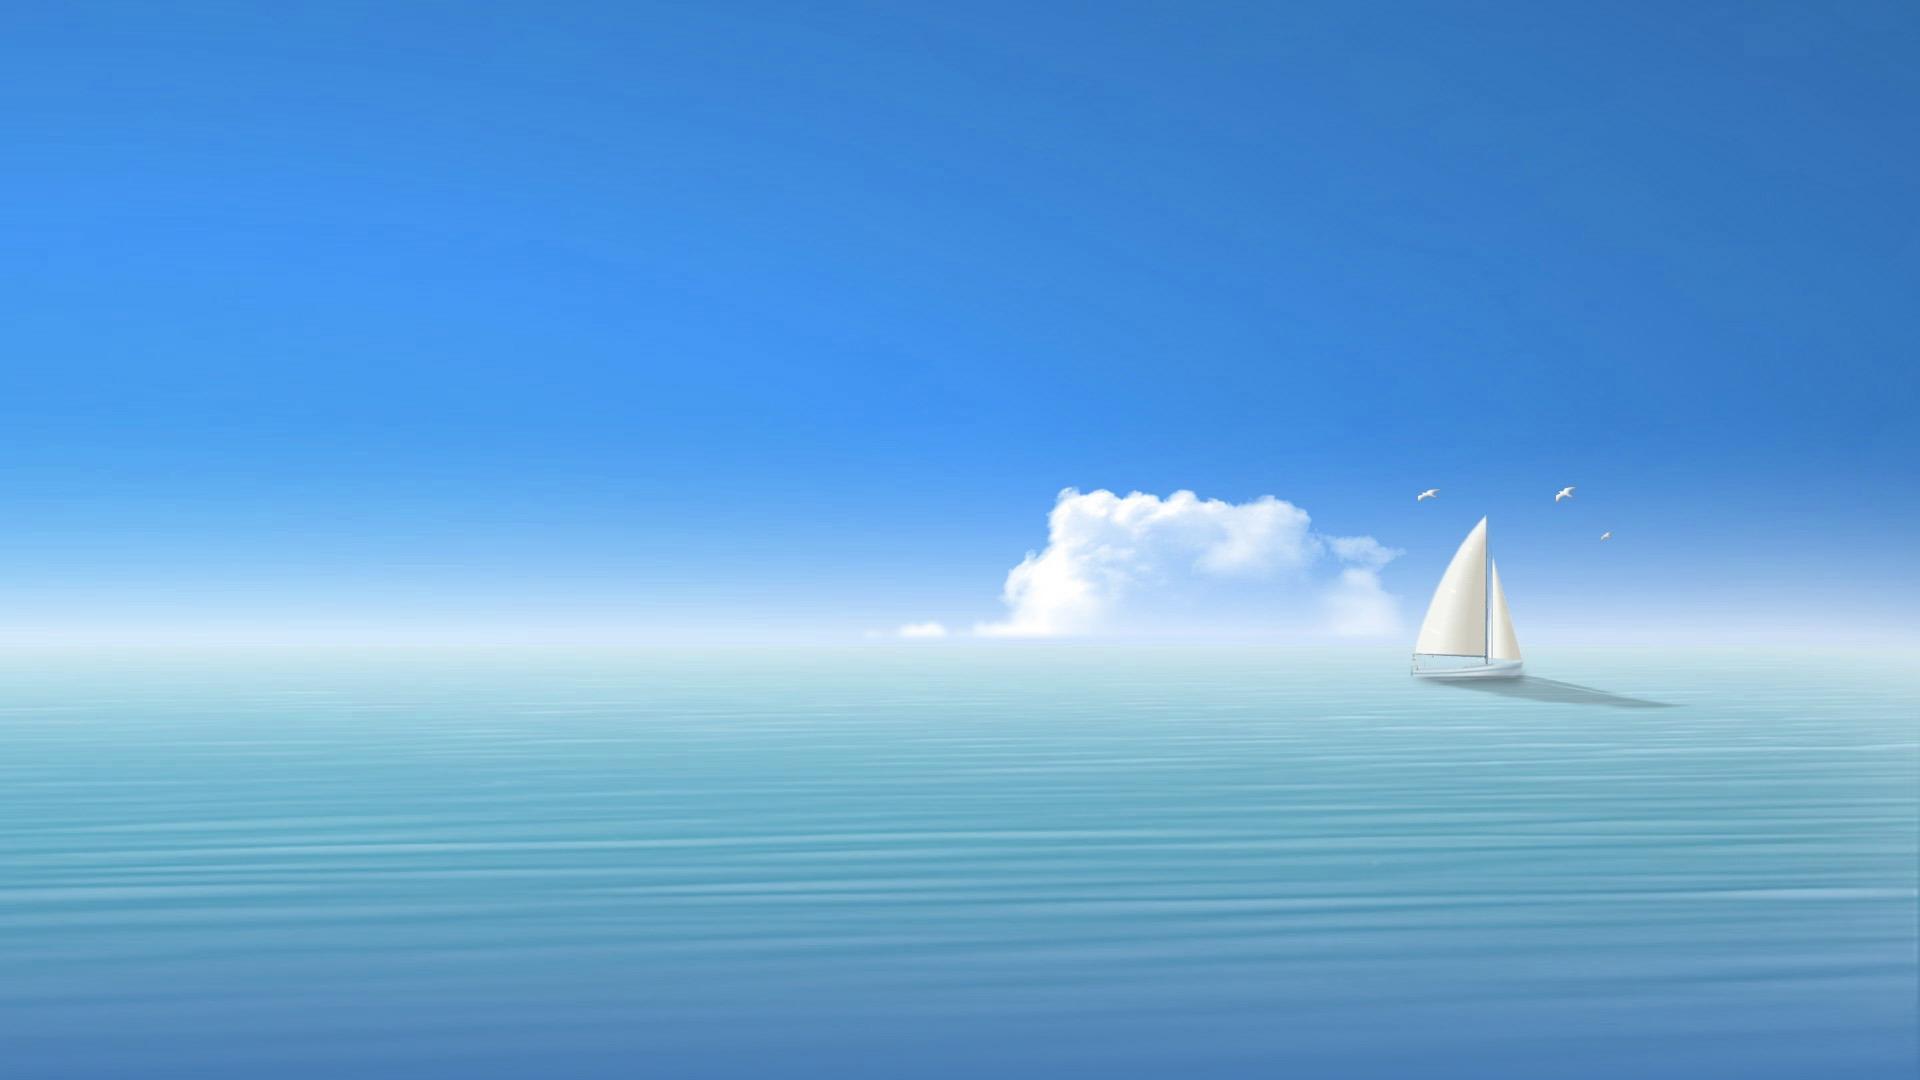 Download Wallpaper 1920x1080 Blue Sea Ship Sky Full HD 1080p